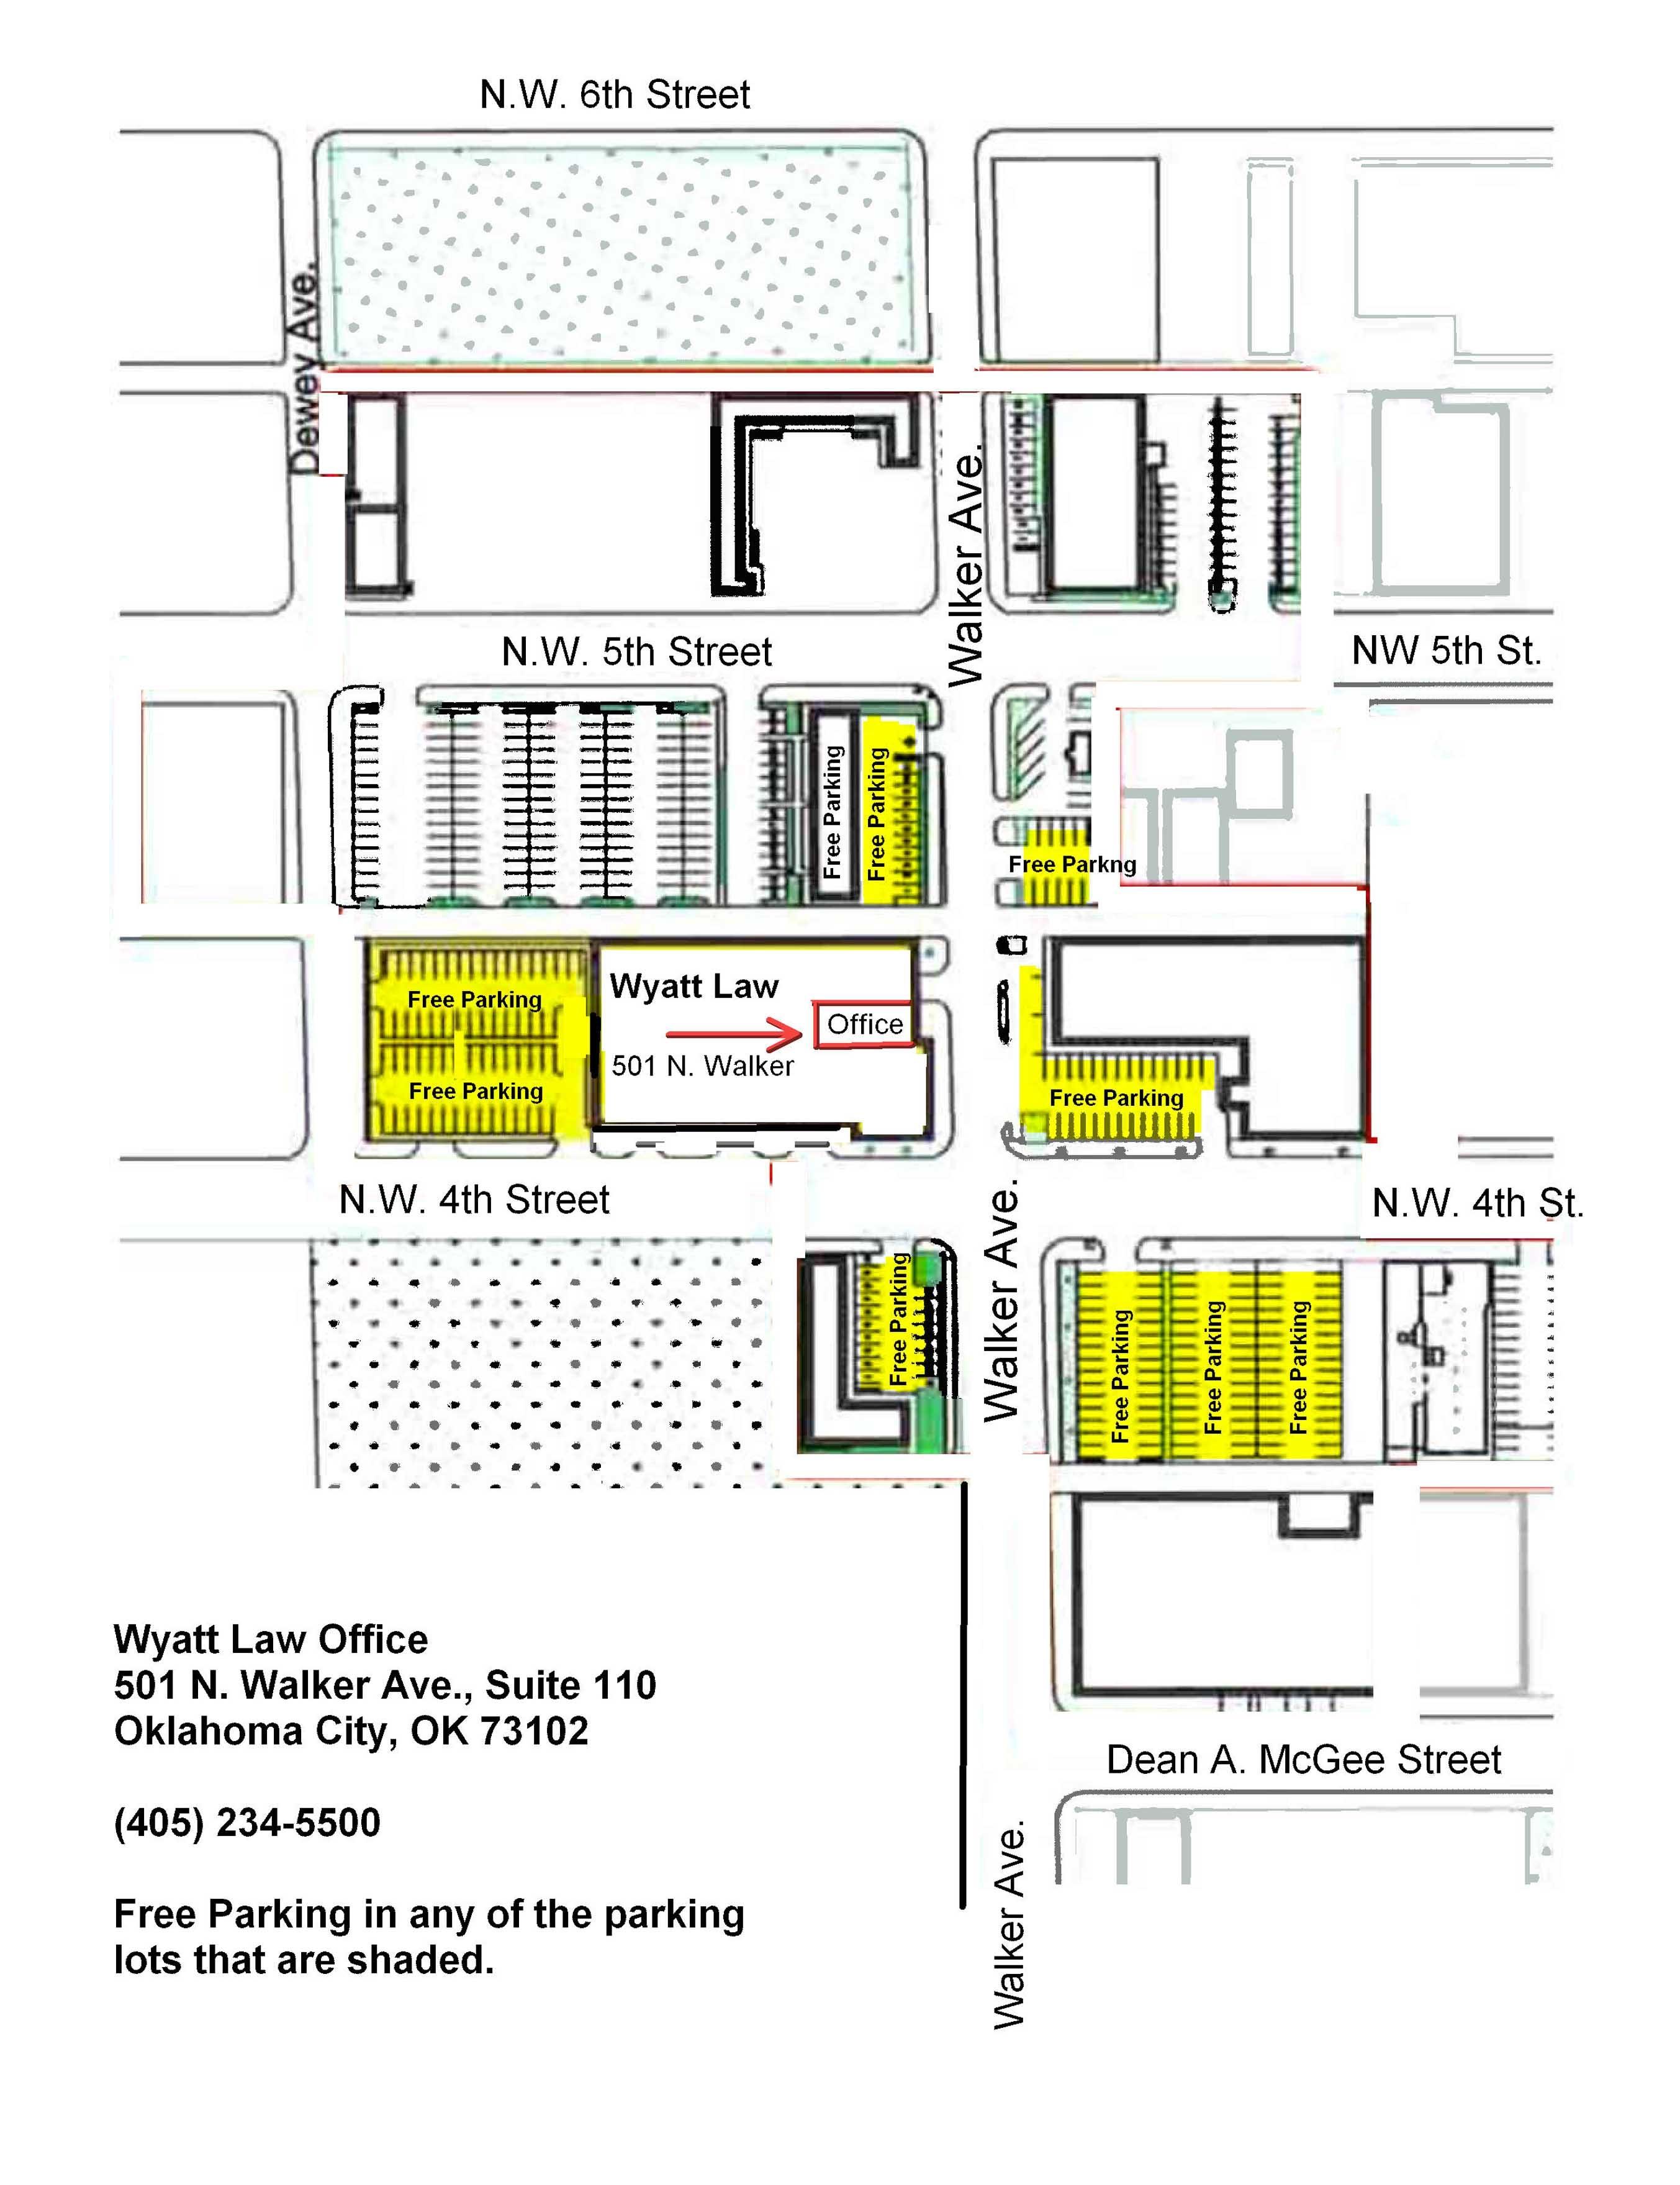 Wyatt Law Office image 5